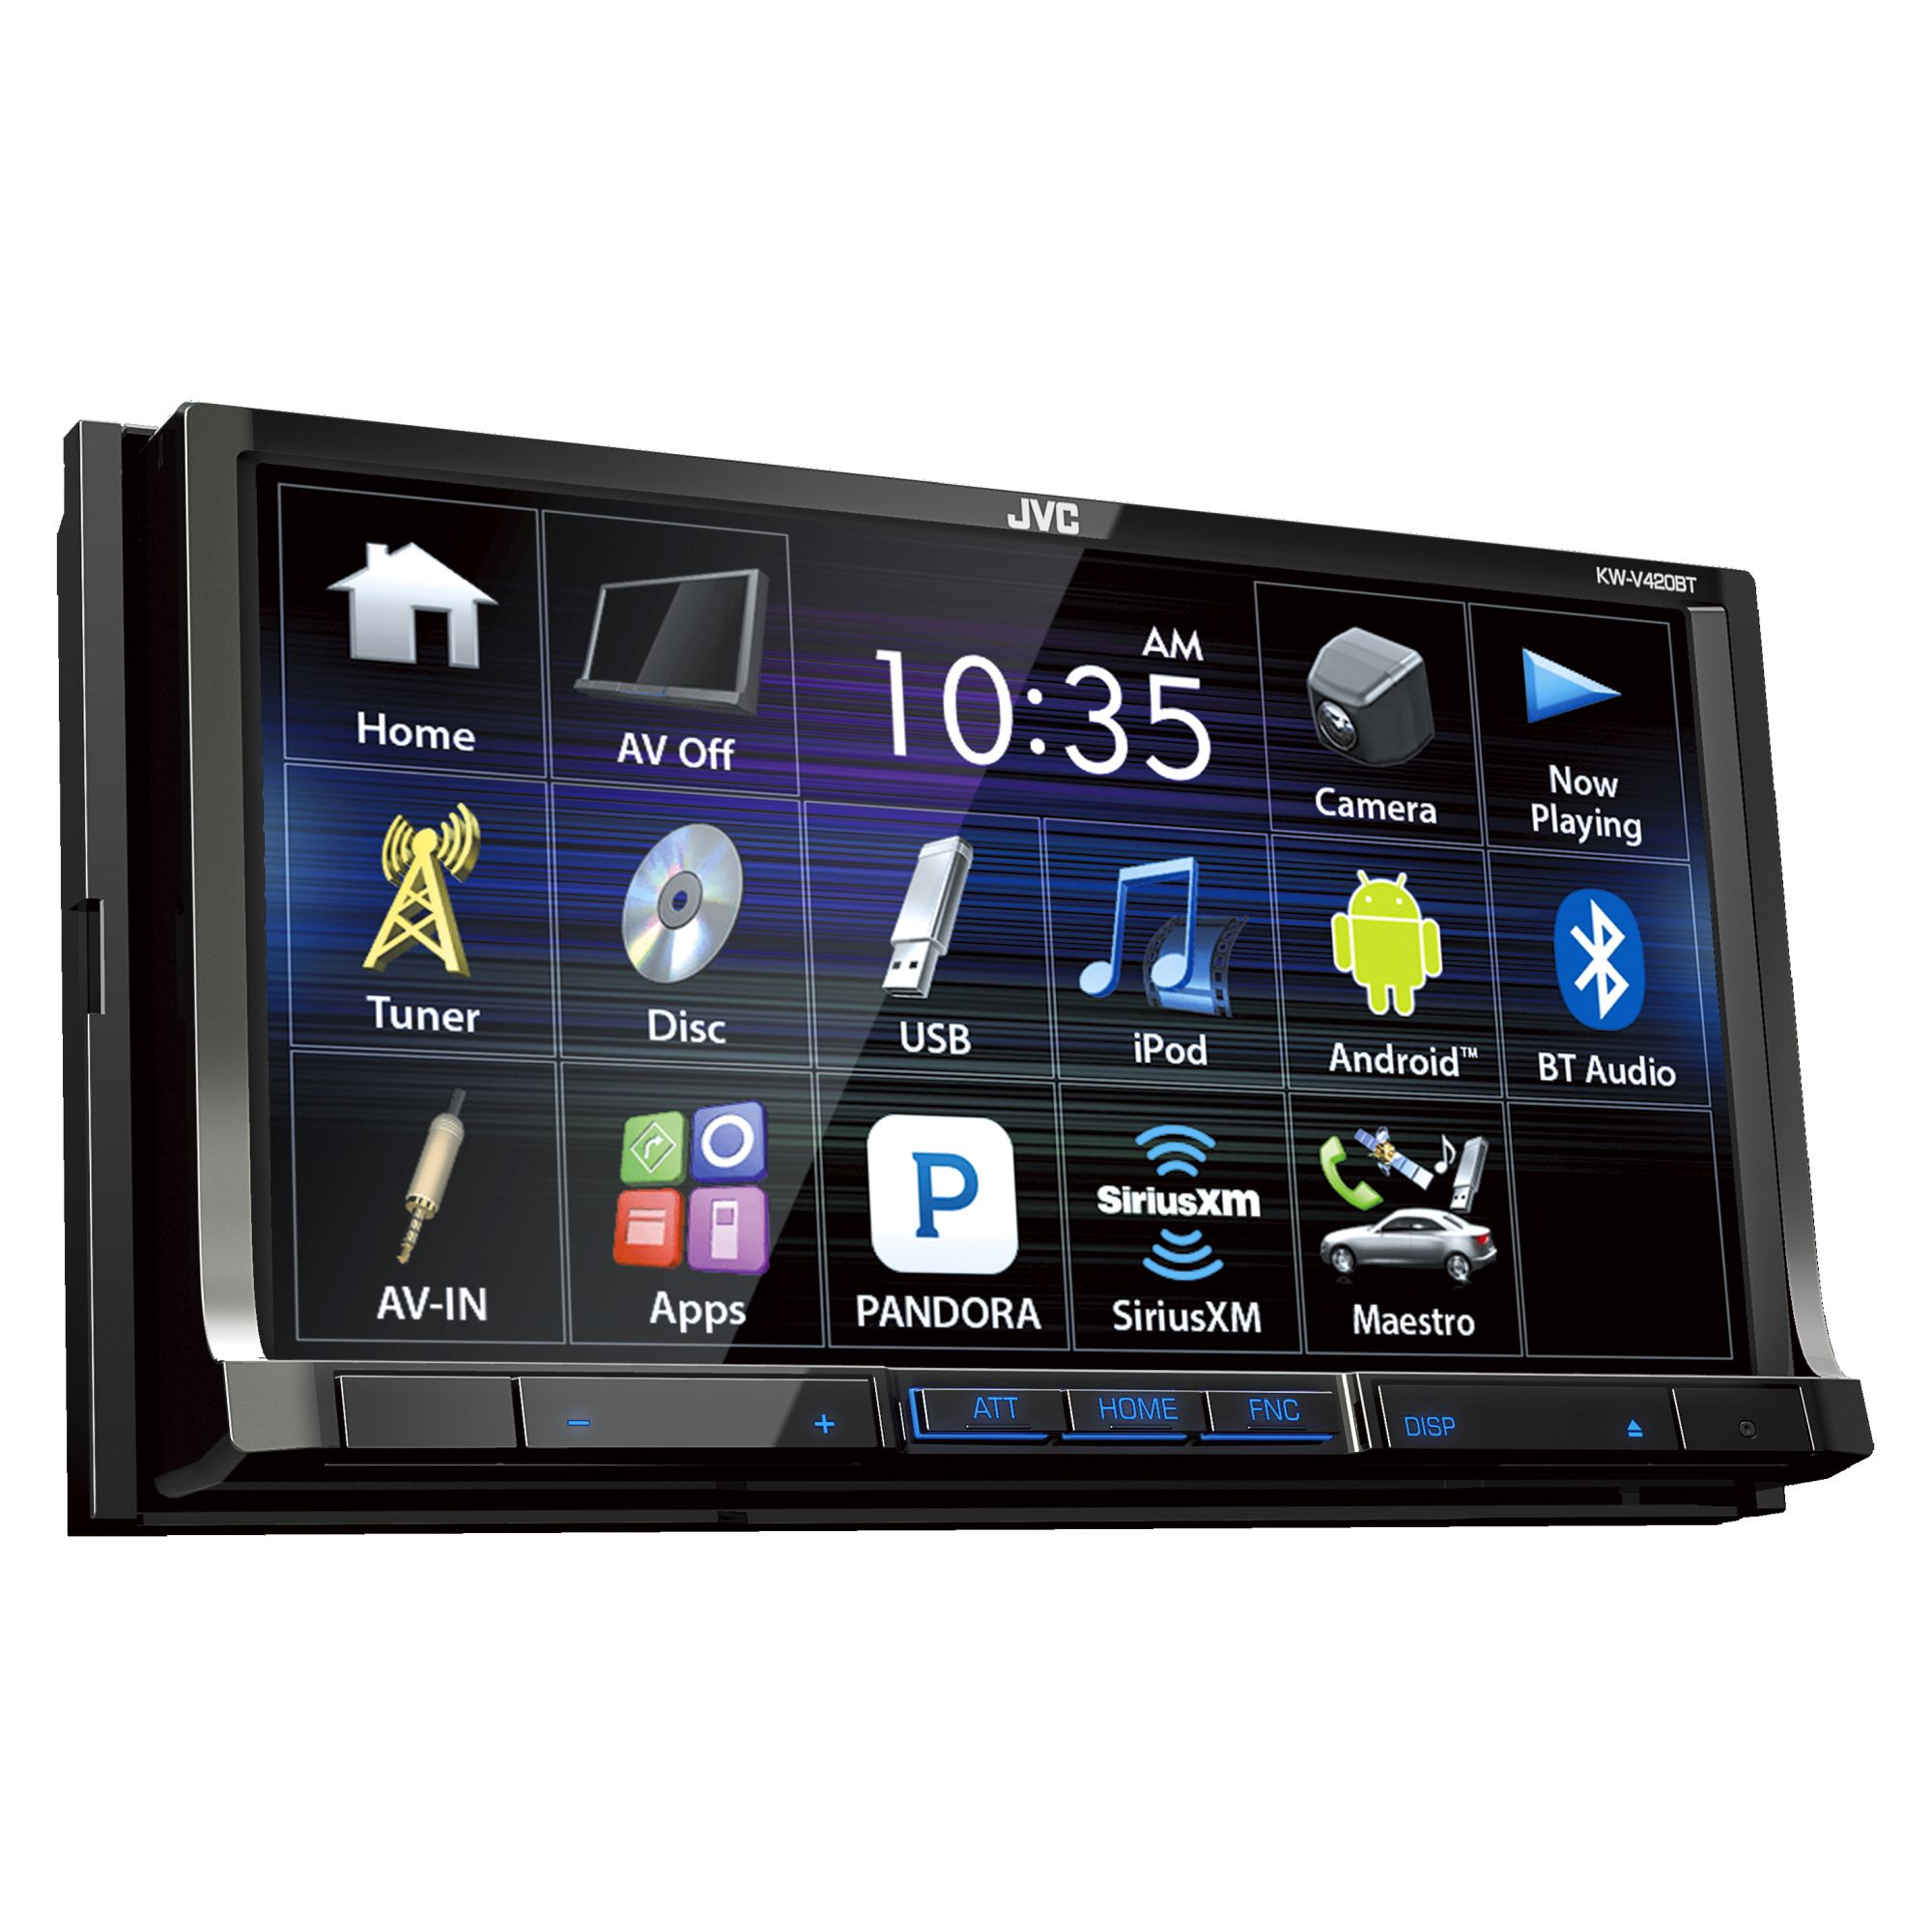 jvc kw v420bt 7 double din touchscreen bt dvd cd am fm in dash car stereo ebay. Black Bedroom Furniture Sets. Home Design Ideas